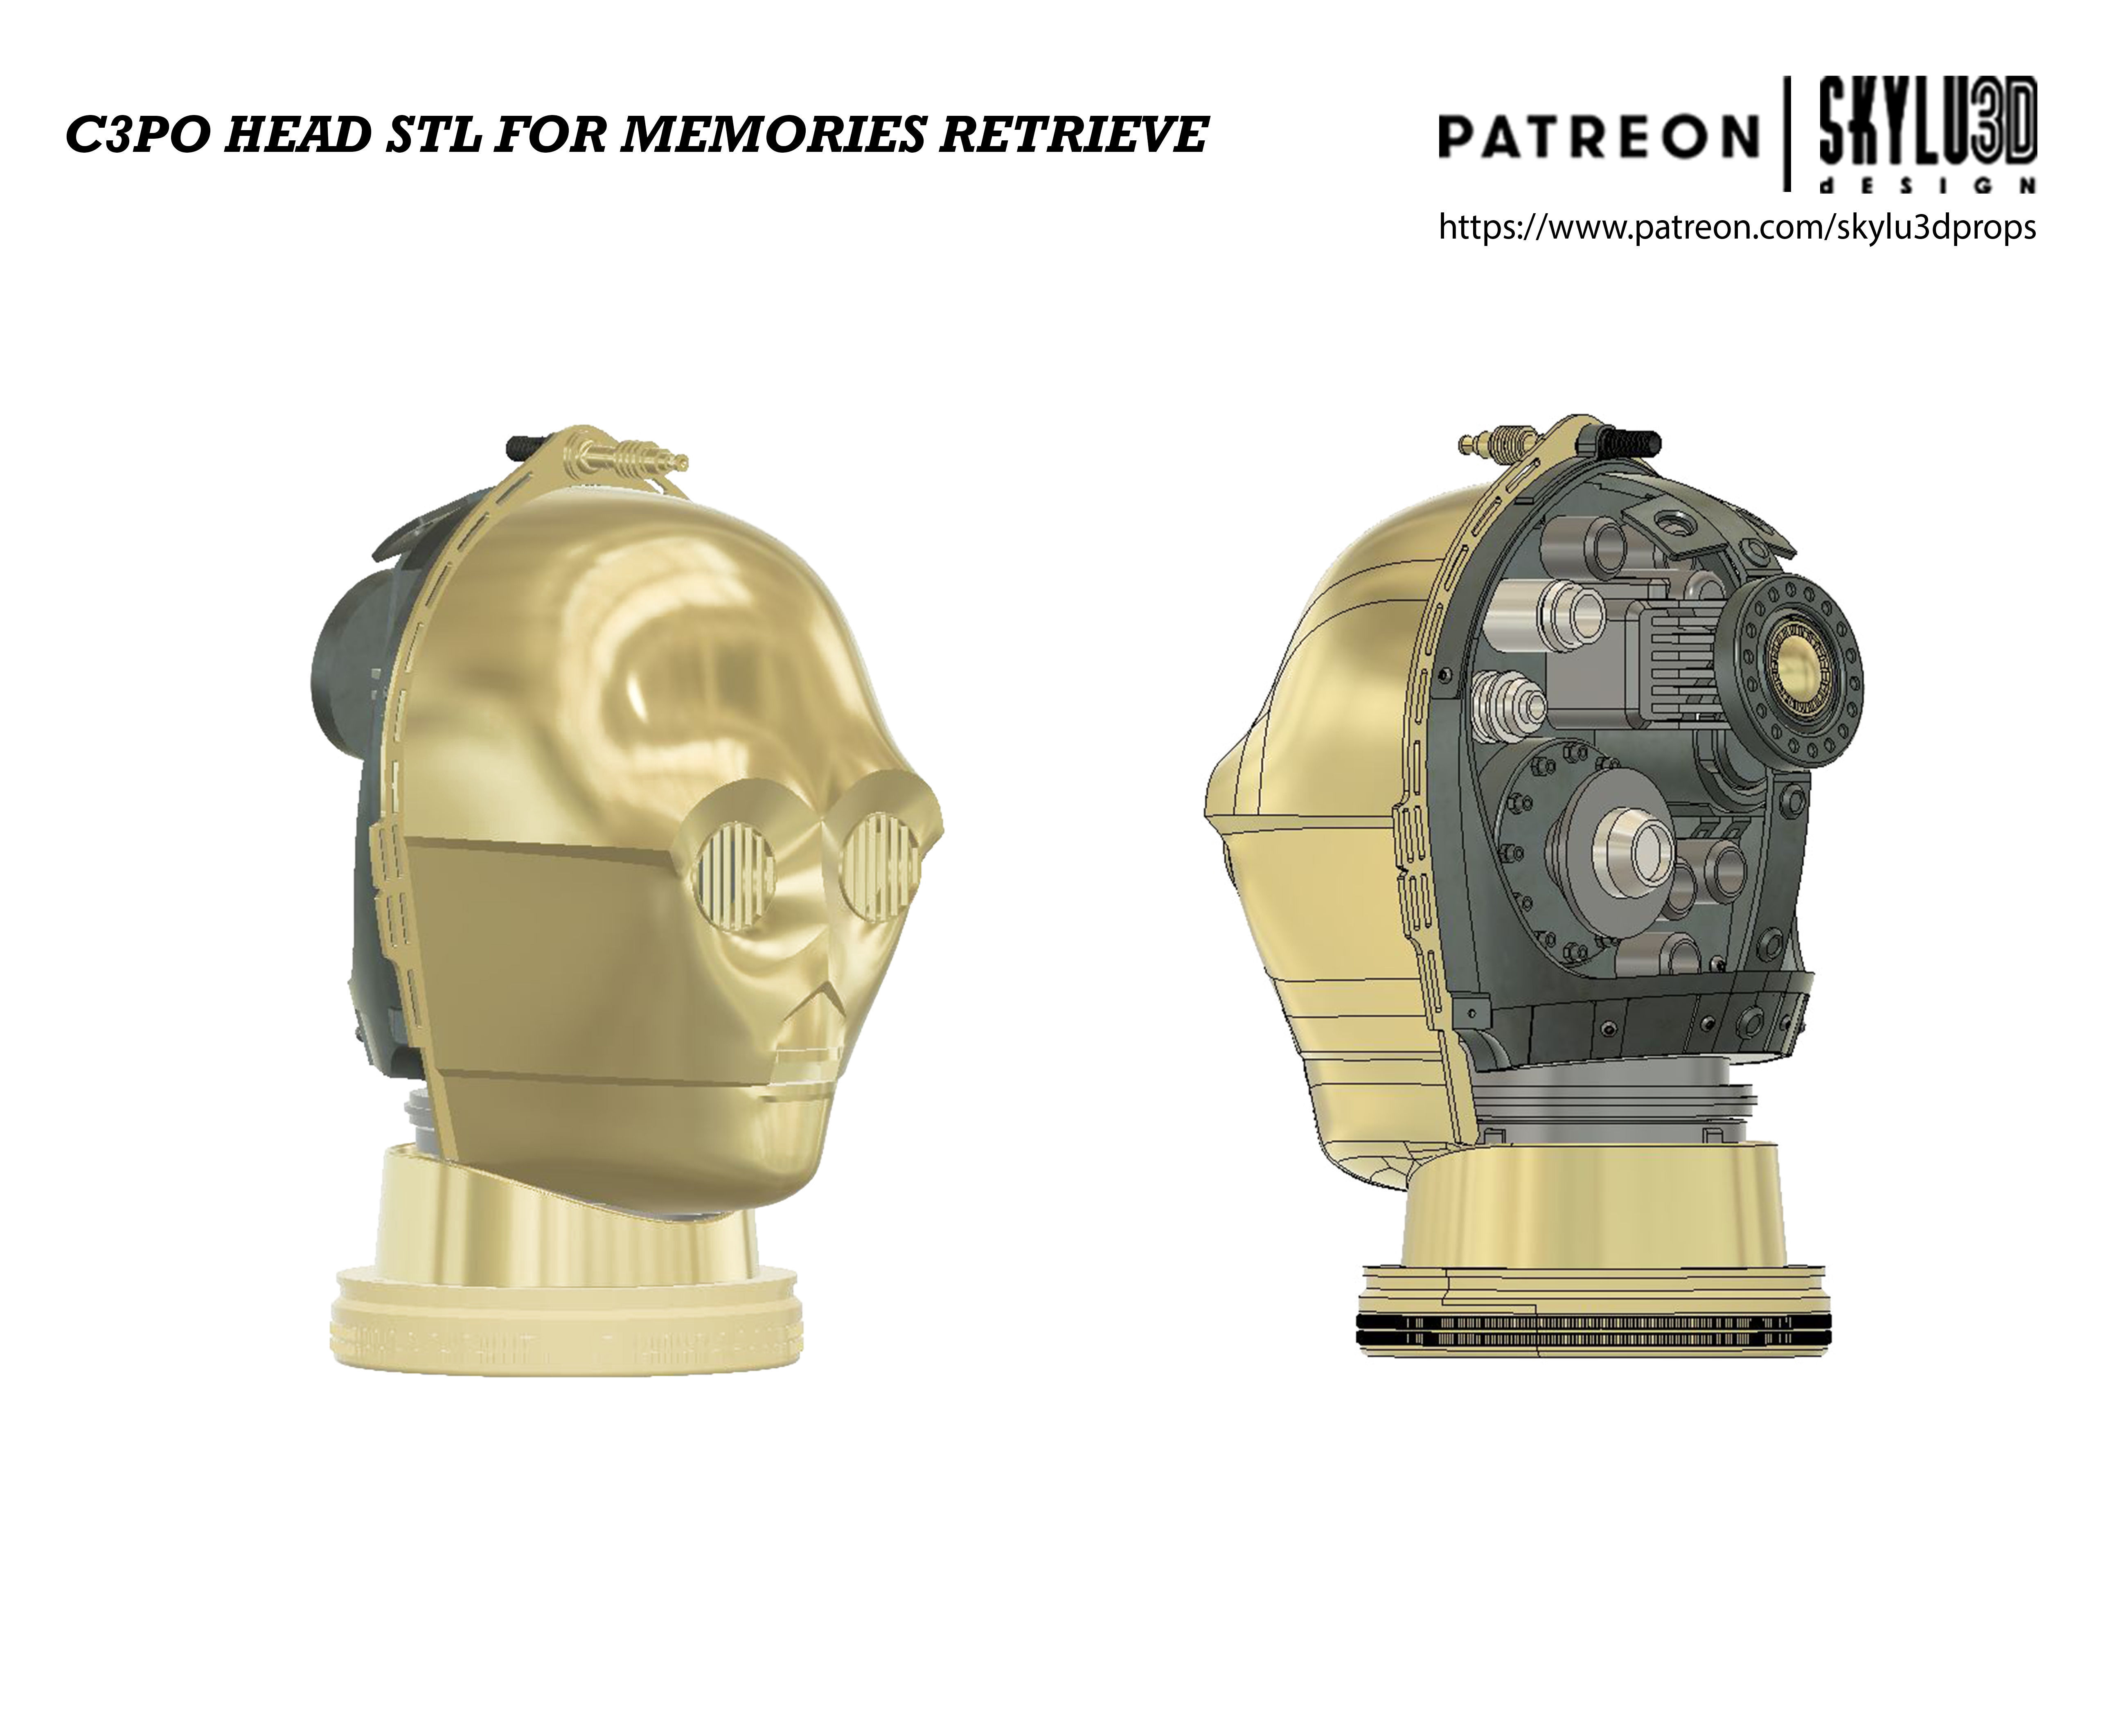 C3PO Memories Retrieve Head Life size STL